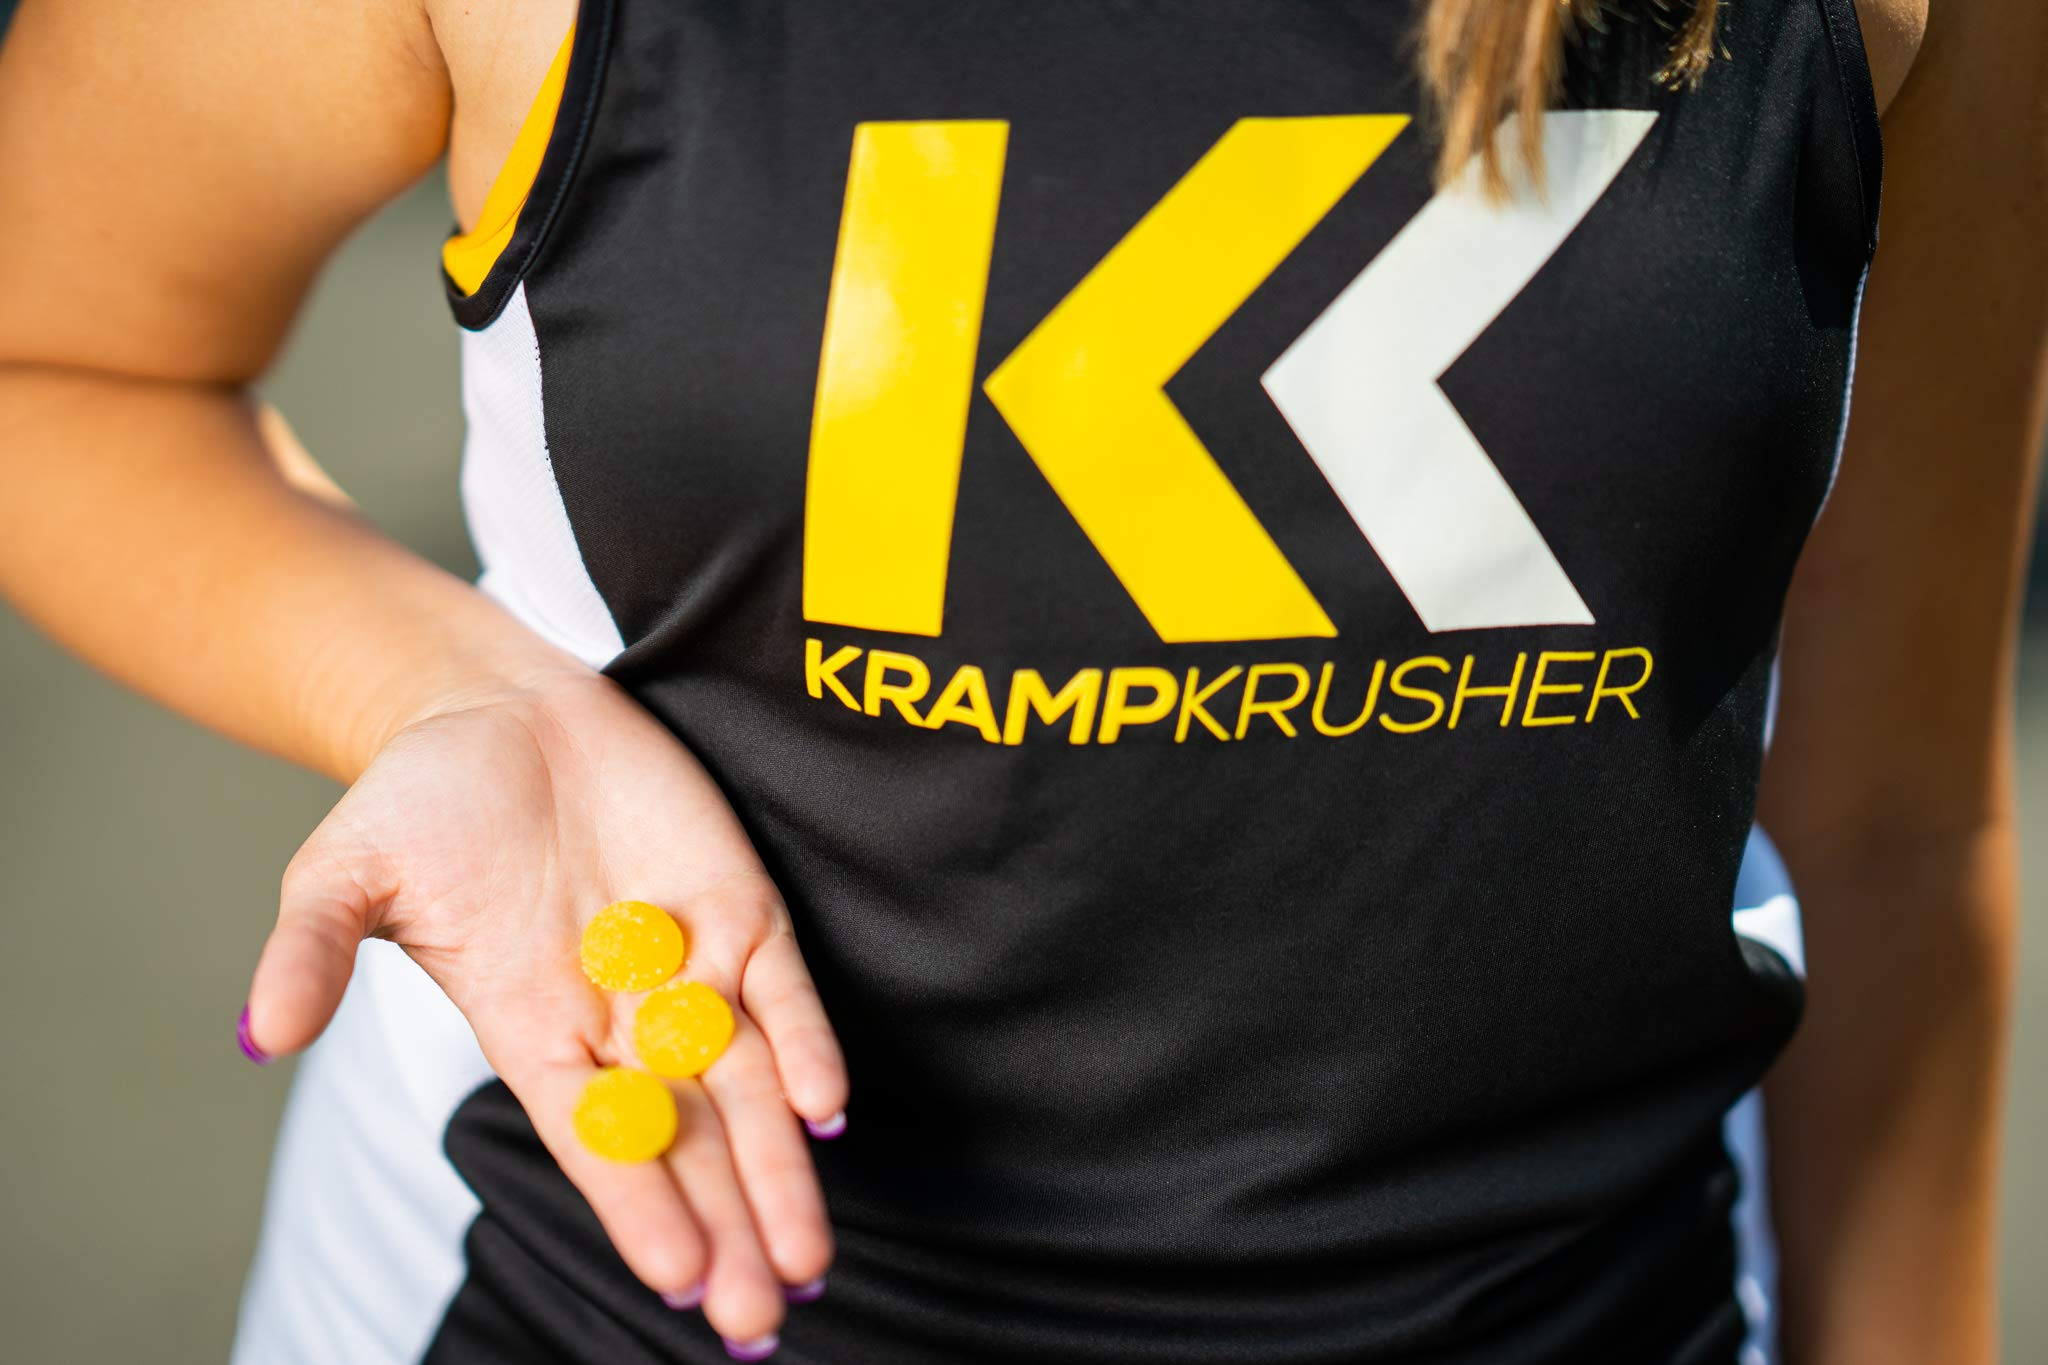 Kramp Krusher: Vegan Energy Chews with Potassium Electrolytes | Caffeine Free Pre Workout Gummies for Leg Cramps, Sports, Running, and Fitness Training | On-The-Go Endurance Enhancers (Lemon12 Pack)